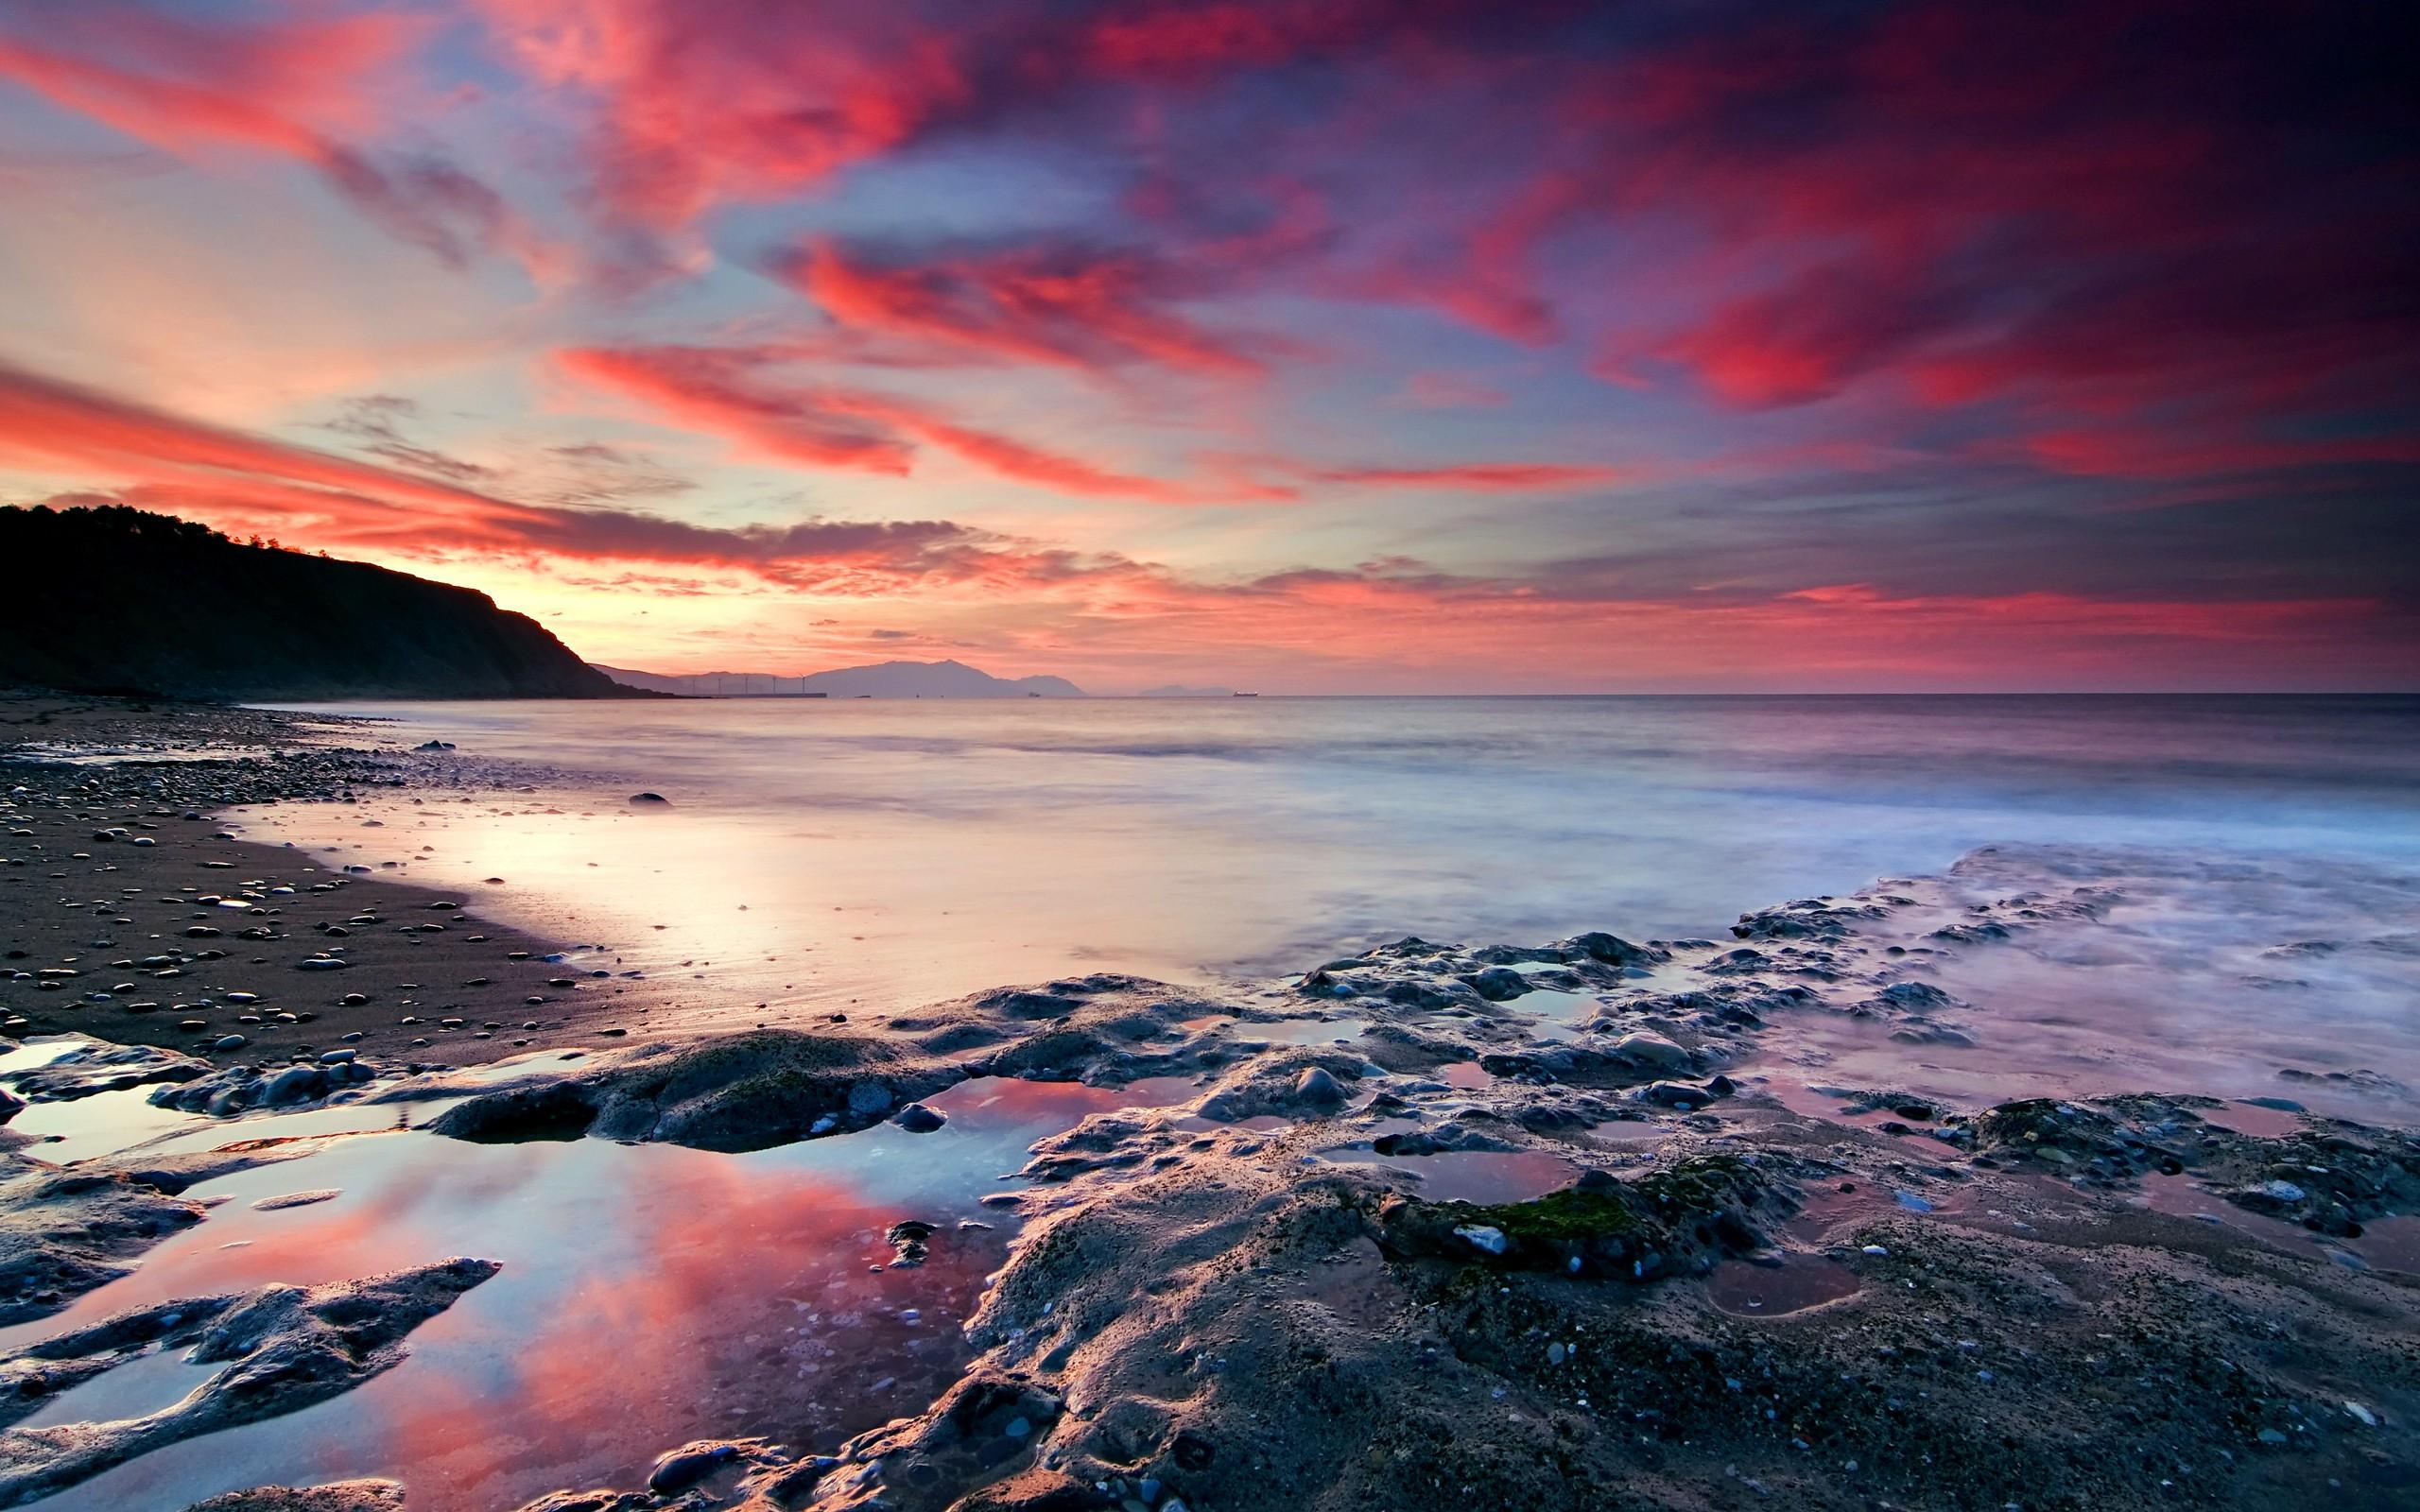 Fondos para android paisajes marinos adnfriki for Fondo de pantalla chulos